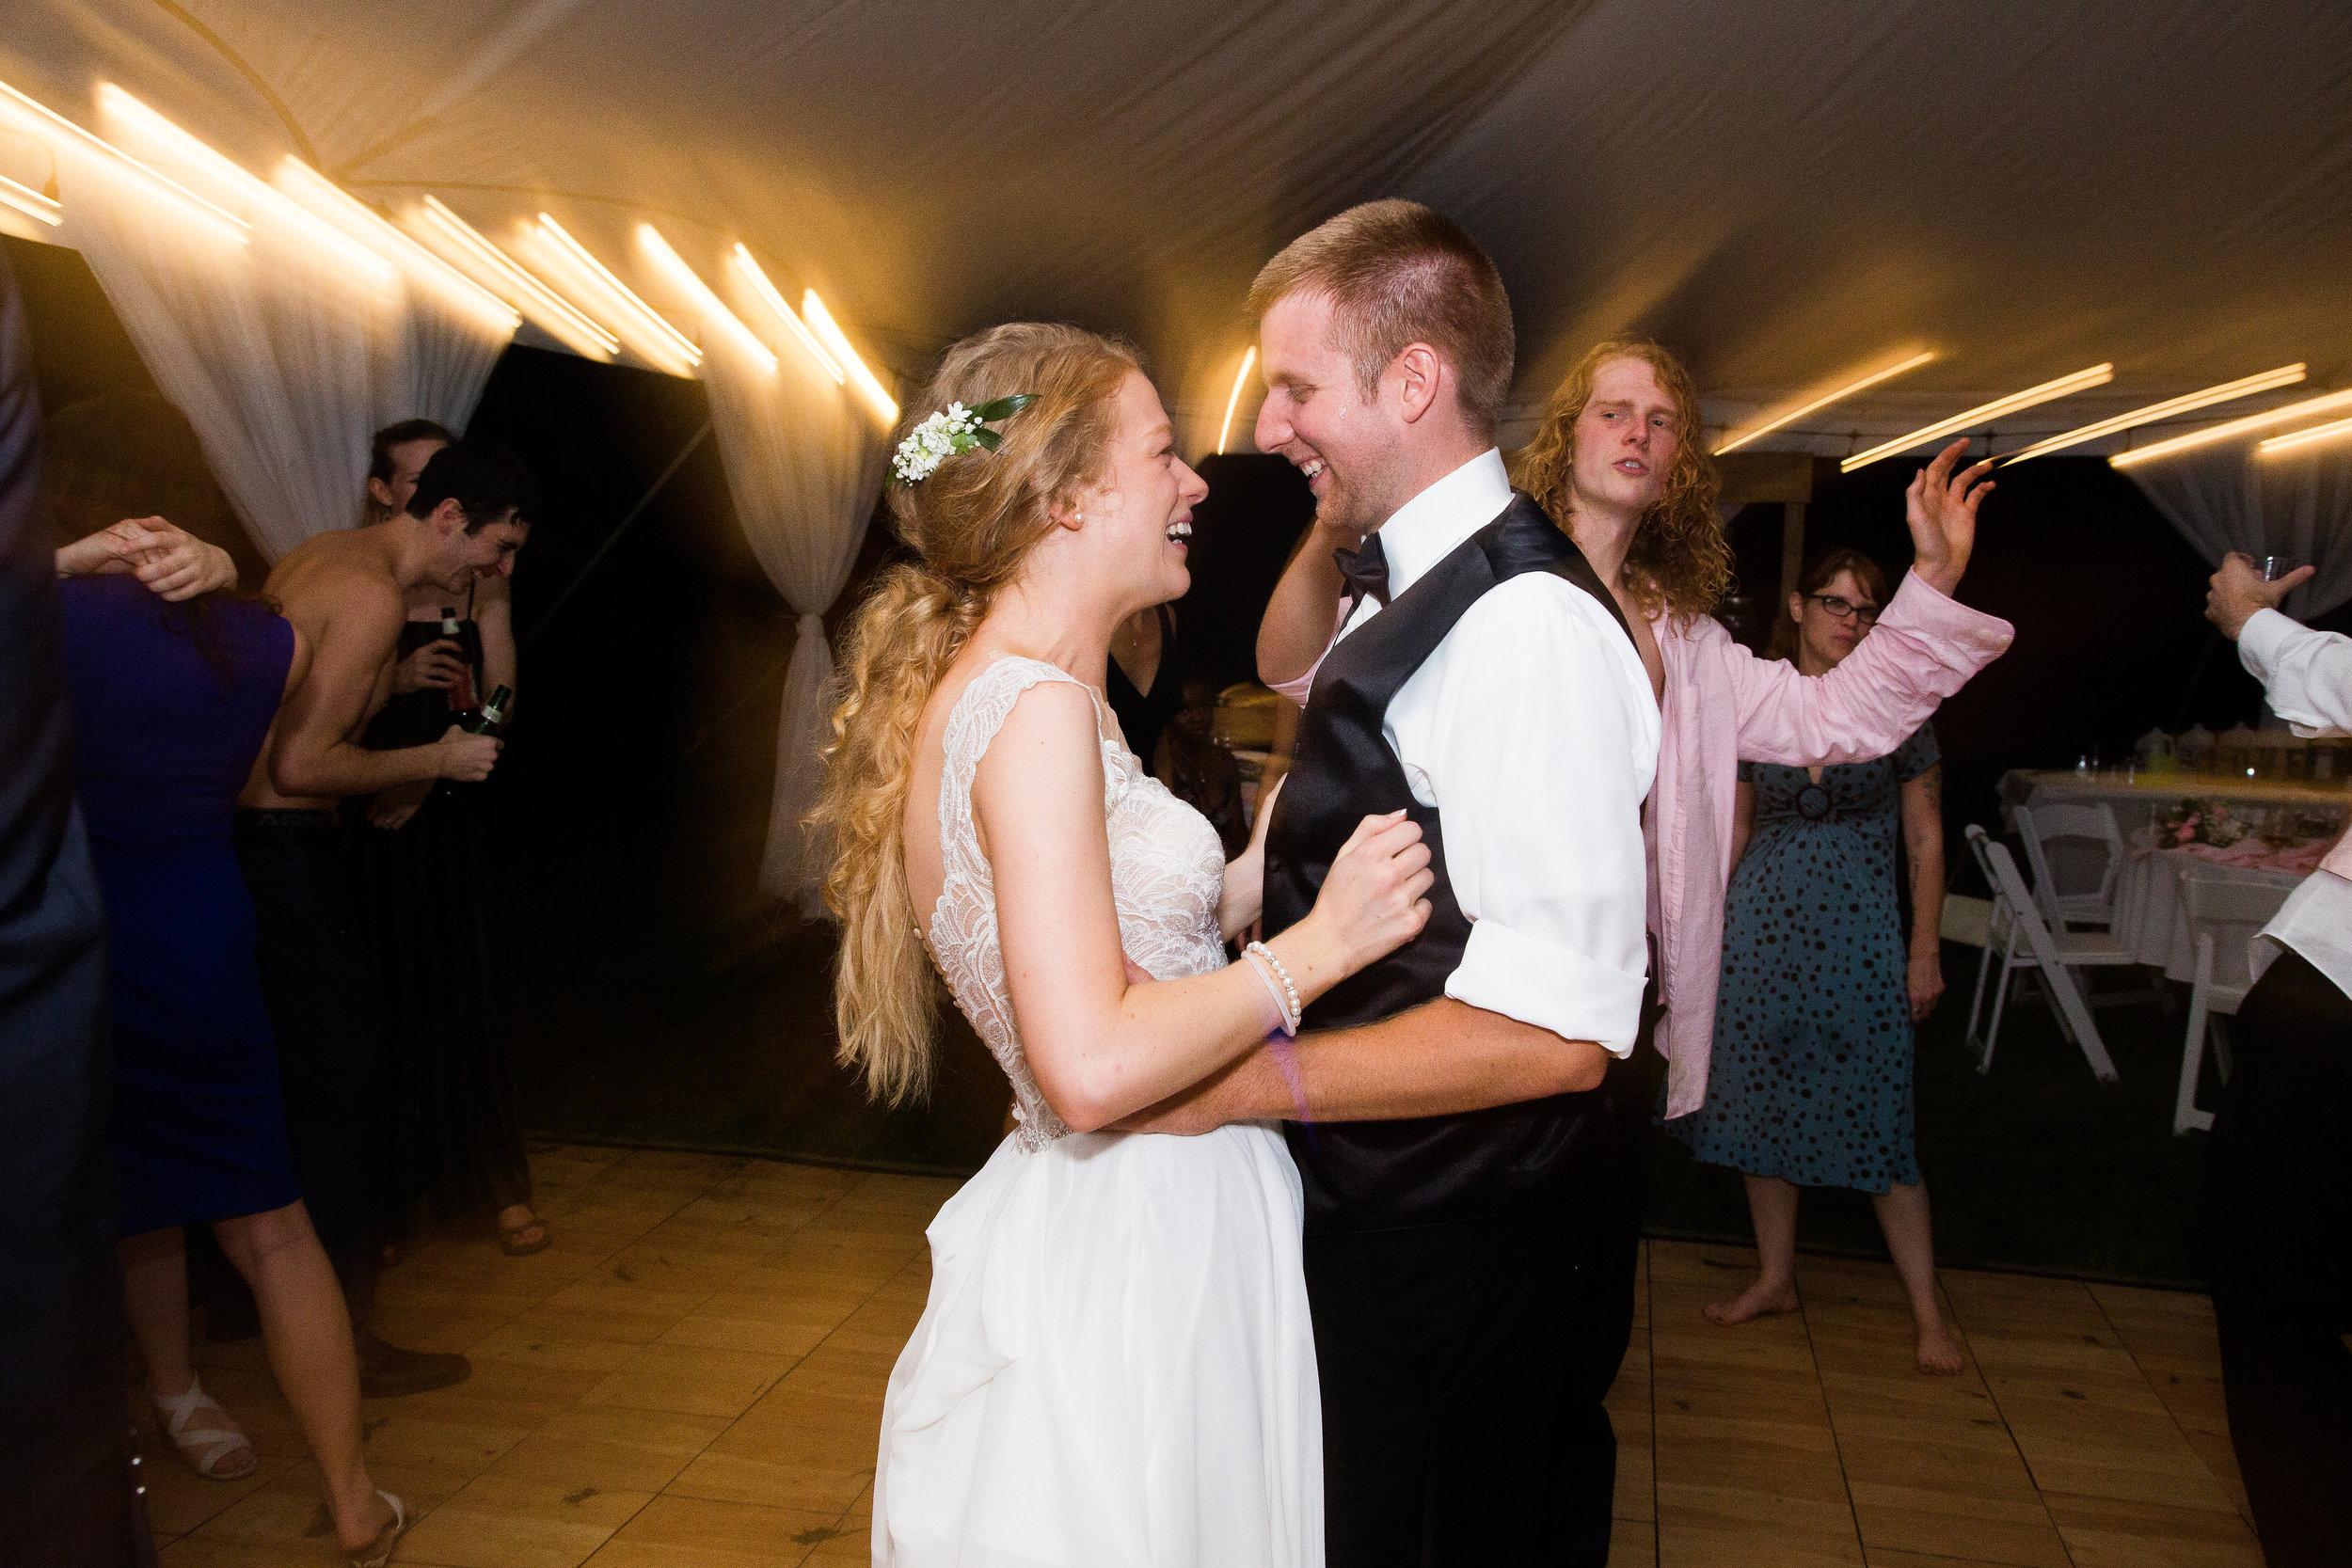 Dancing&Reception_MargaretWroblewskiPhotography180623-150.jpg